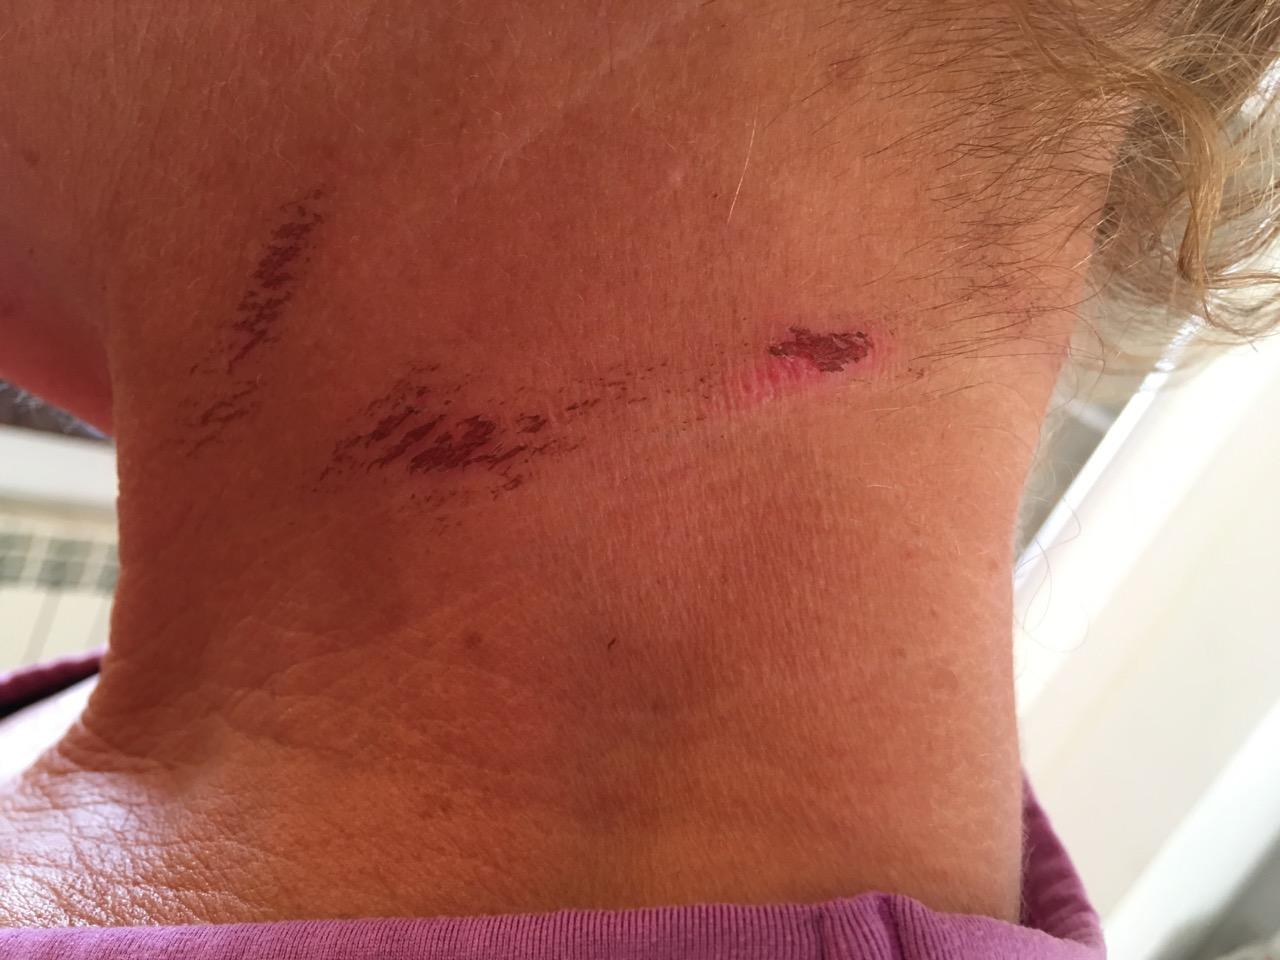 Swimrun injuries